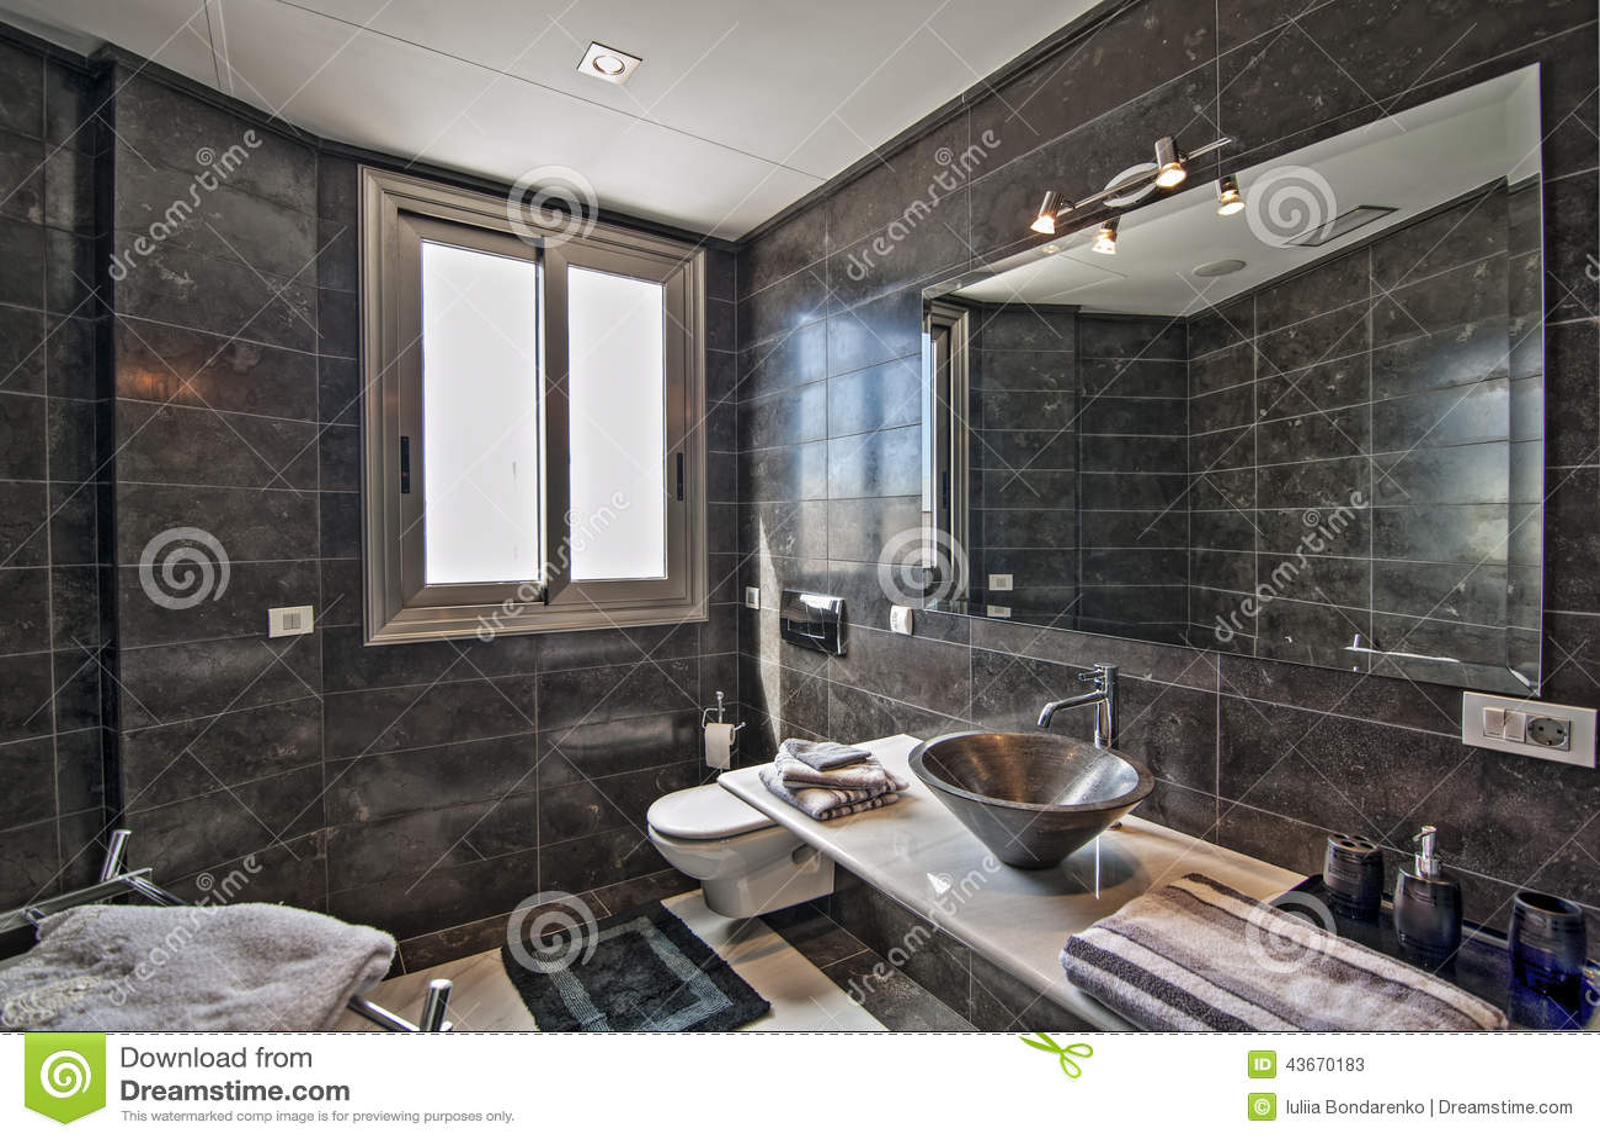 badezimmer landhaus modern modernes haus. Black Bedroom Furniture Sets. Home Design Ideas